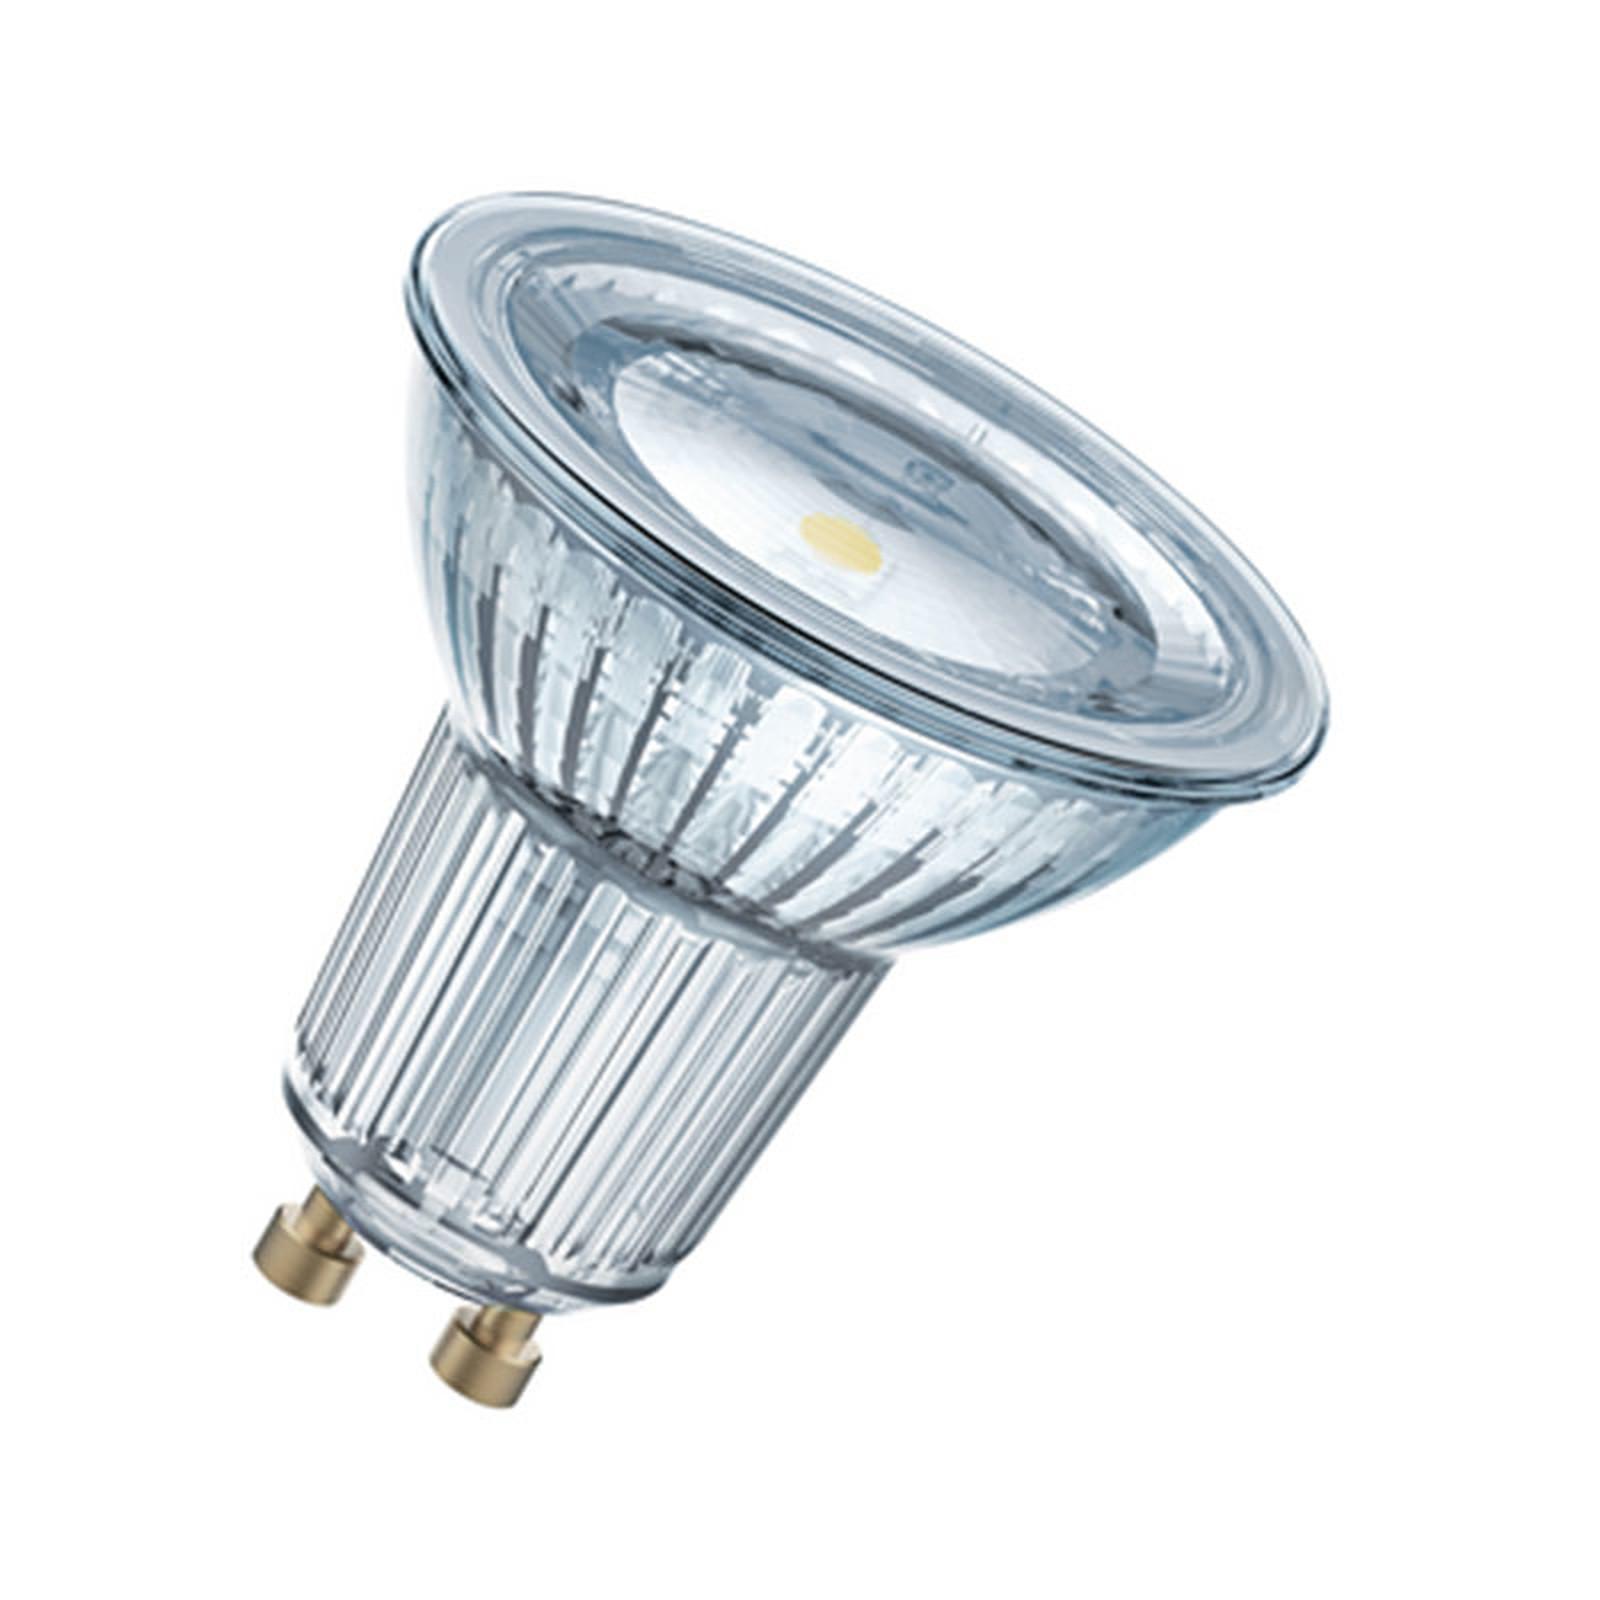 OSRAM LED Bombilla de luz de carretera GU10 4.3W (50W) 120° A+